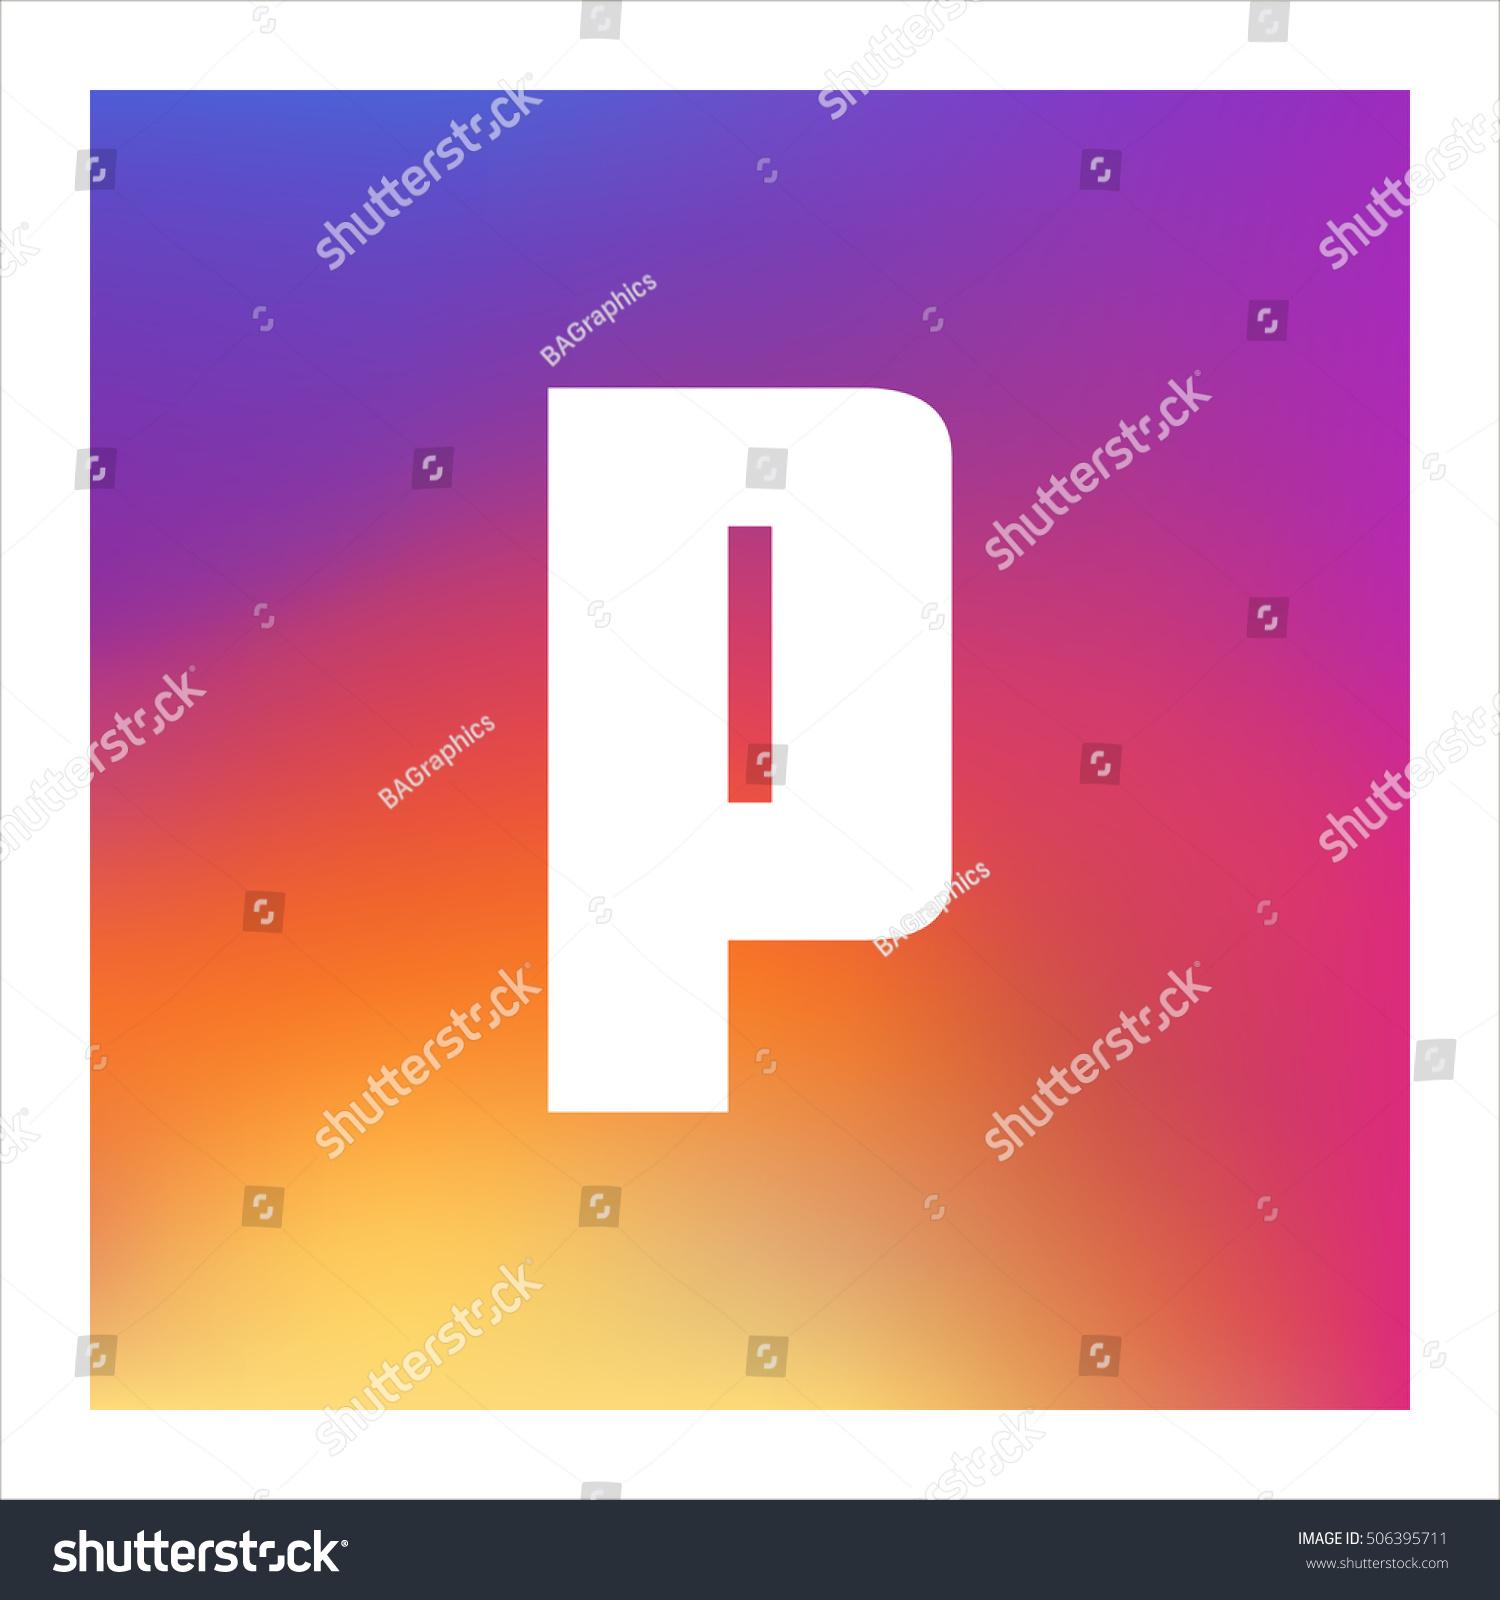 Letter p vector logo useful branding stock vector 506395711 letter p vector logo useful as branding symbol corporate identity alphabet element biocorpaavc